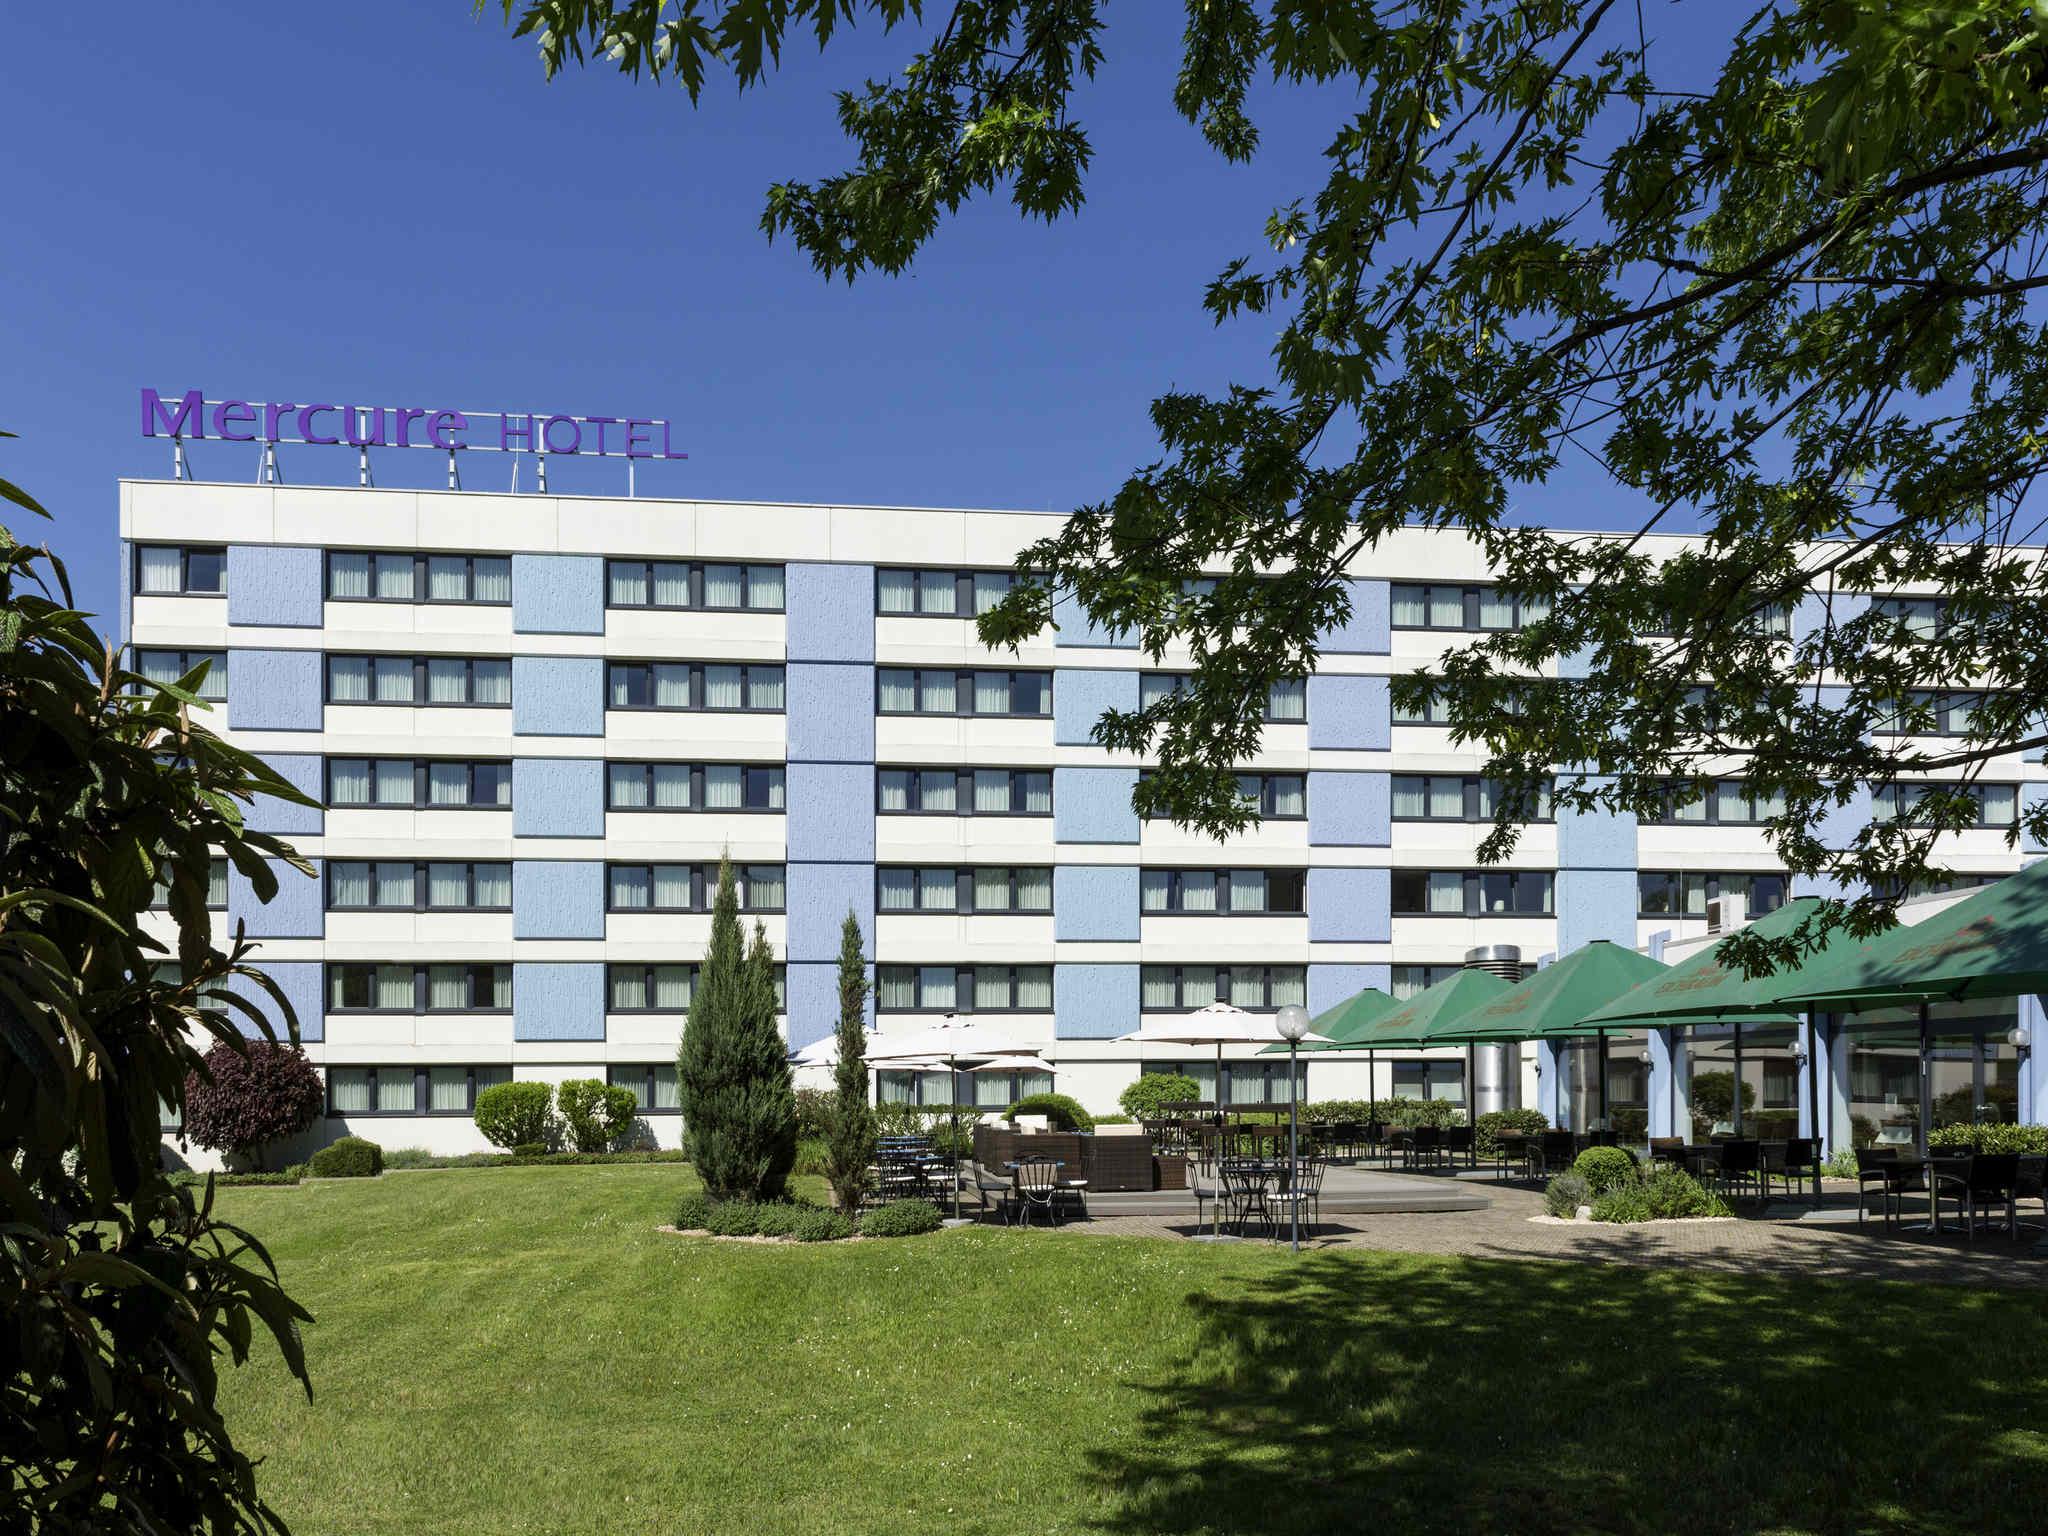 Mercure Hotel Mannheom